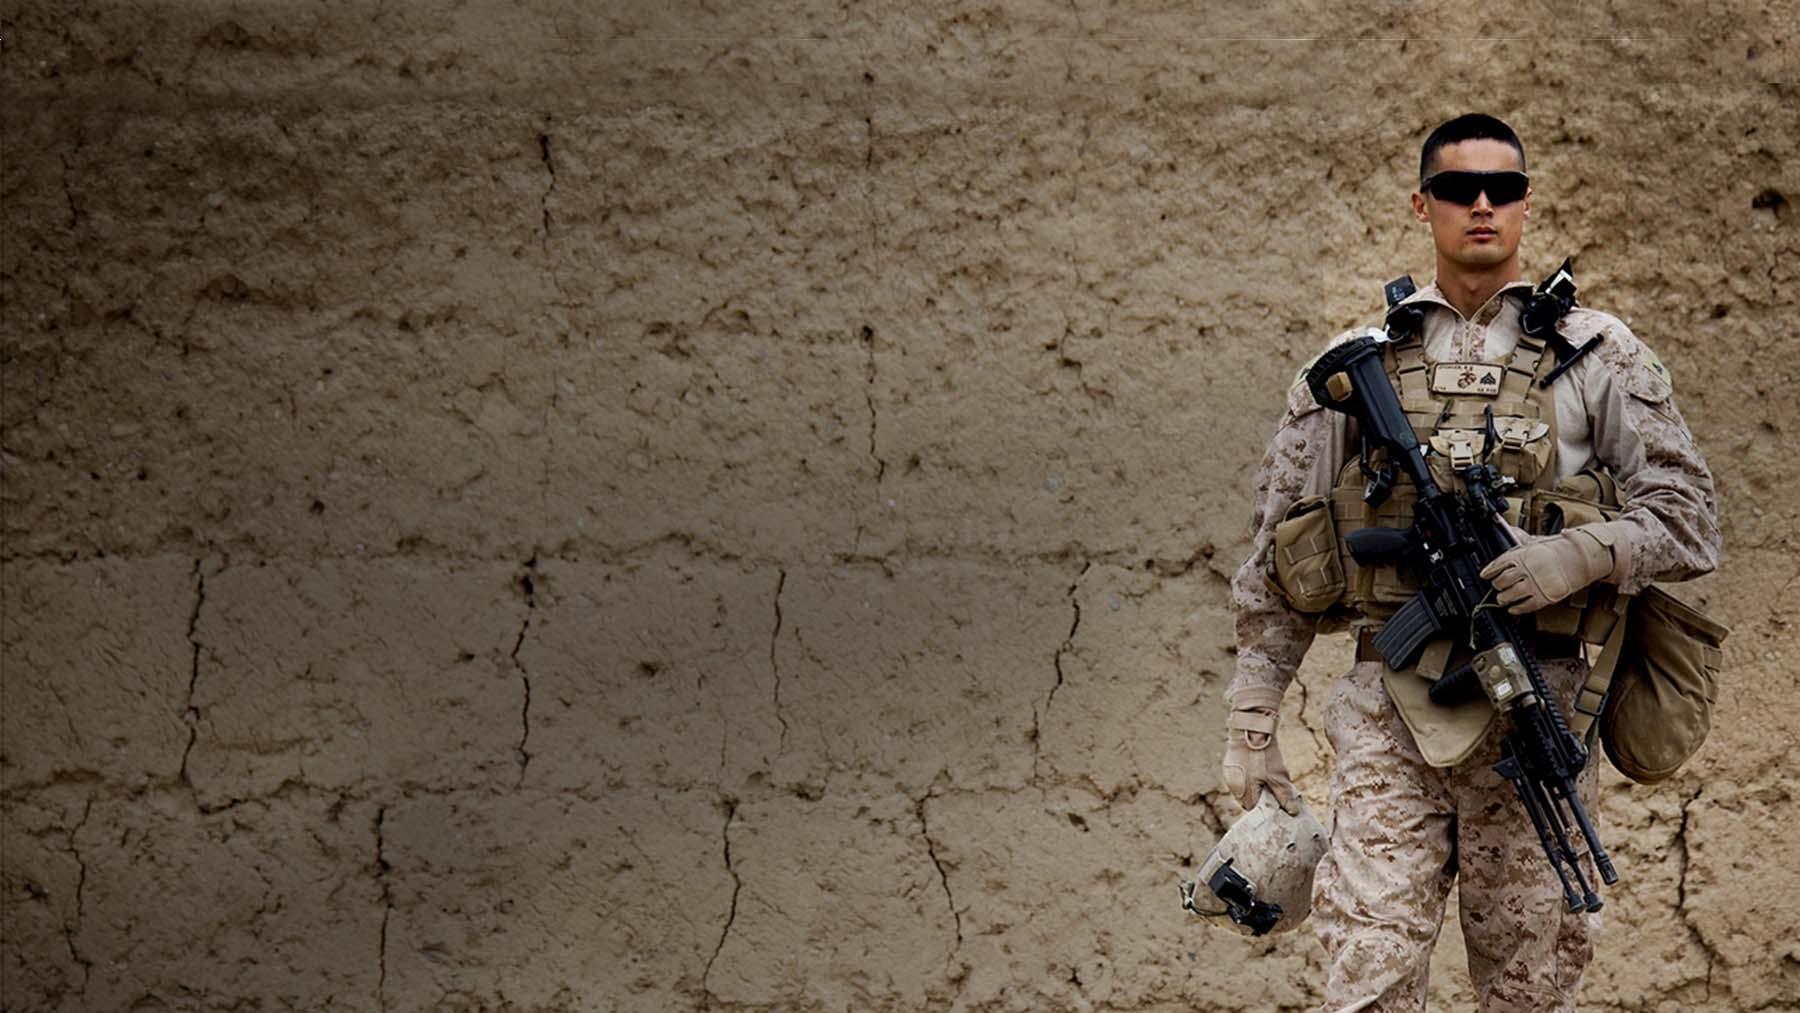 Semper Fi | Marine Corps Mottos, Values, & Principles ...